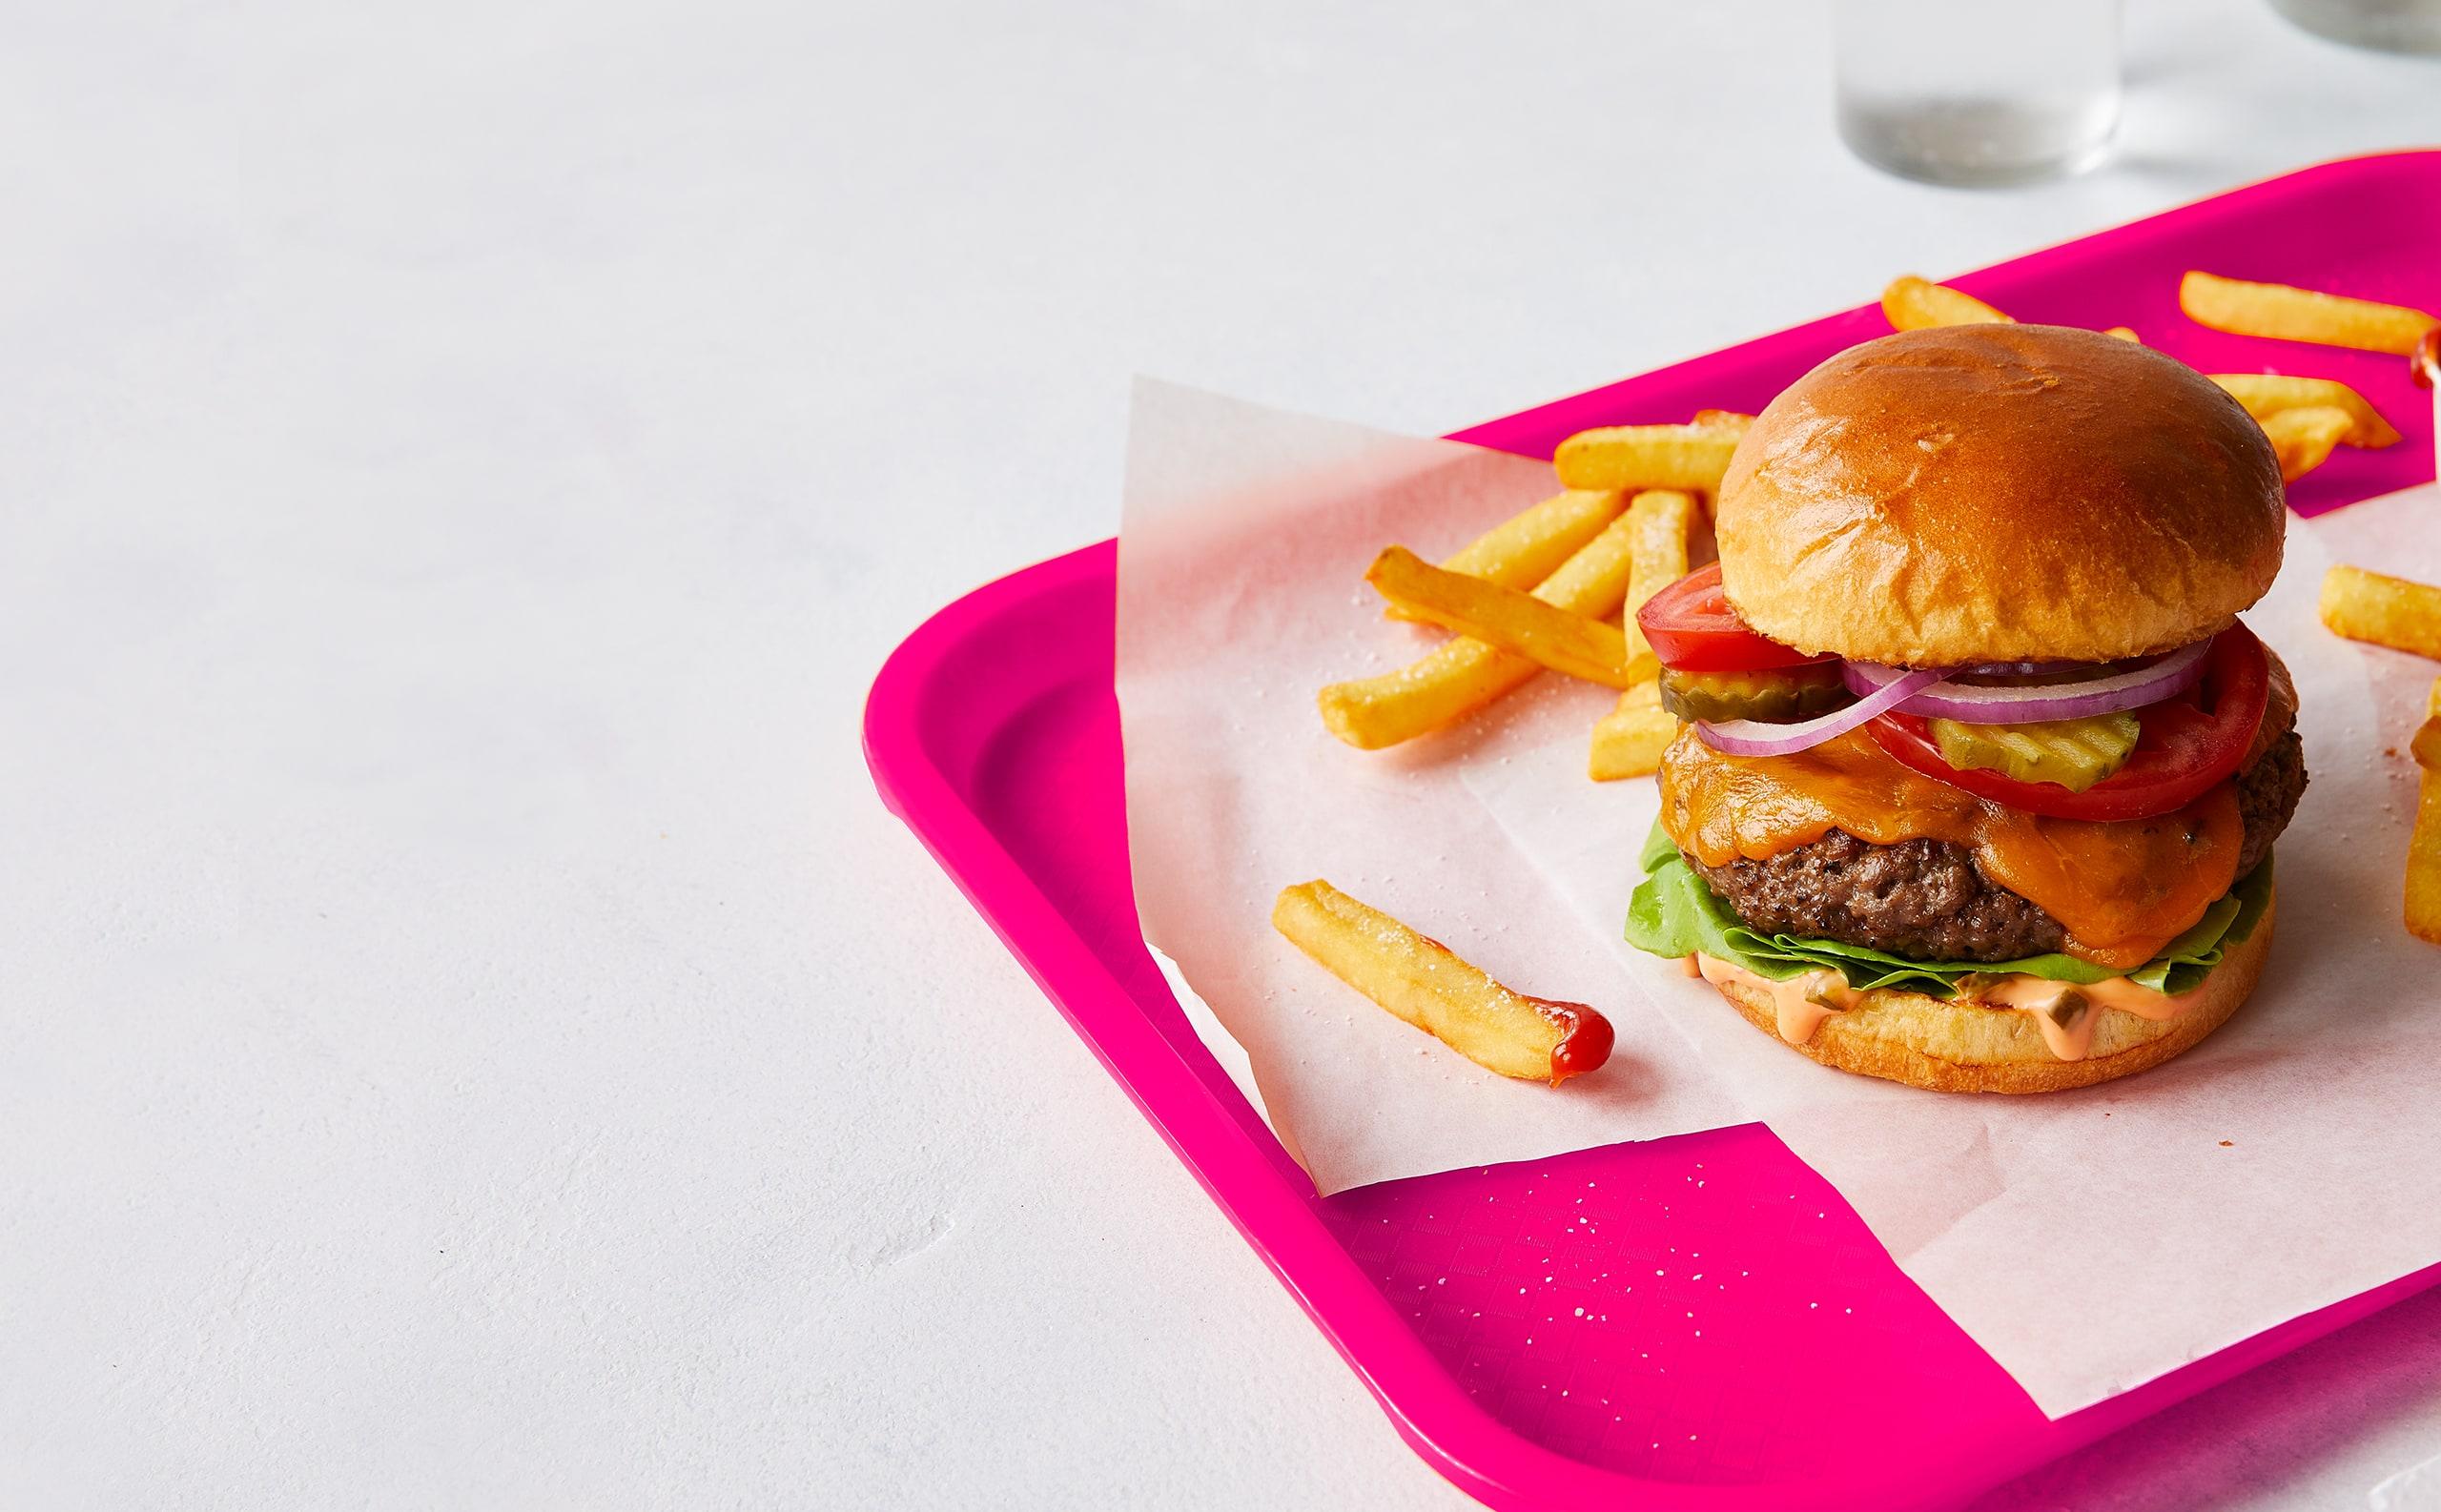 Impossible AmericanaCheeseburger 2560x1586